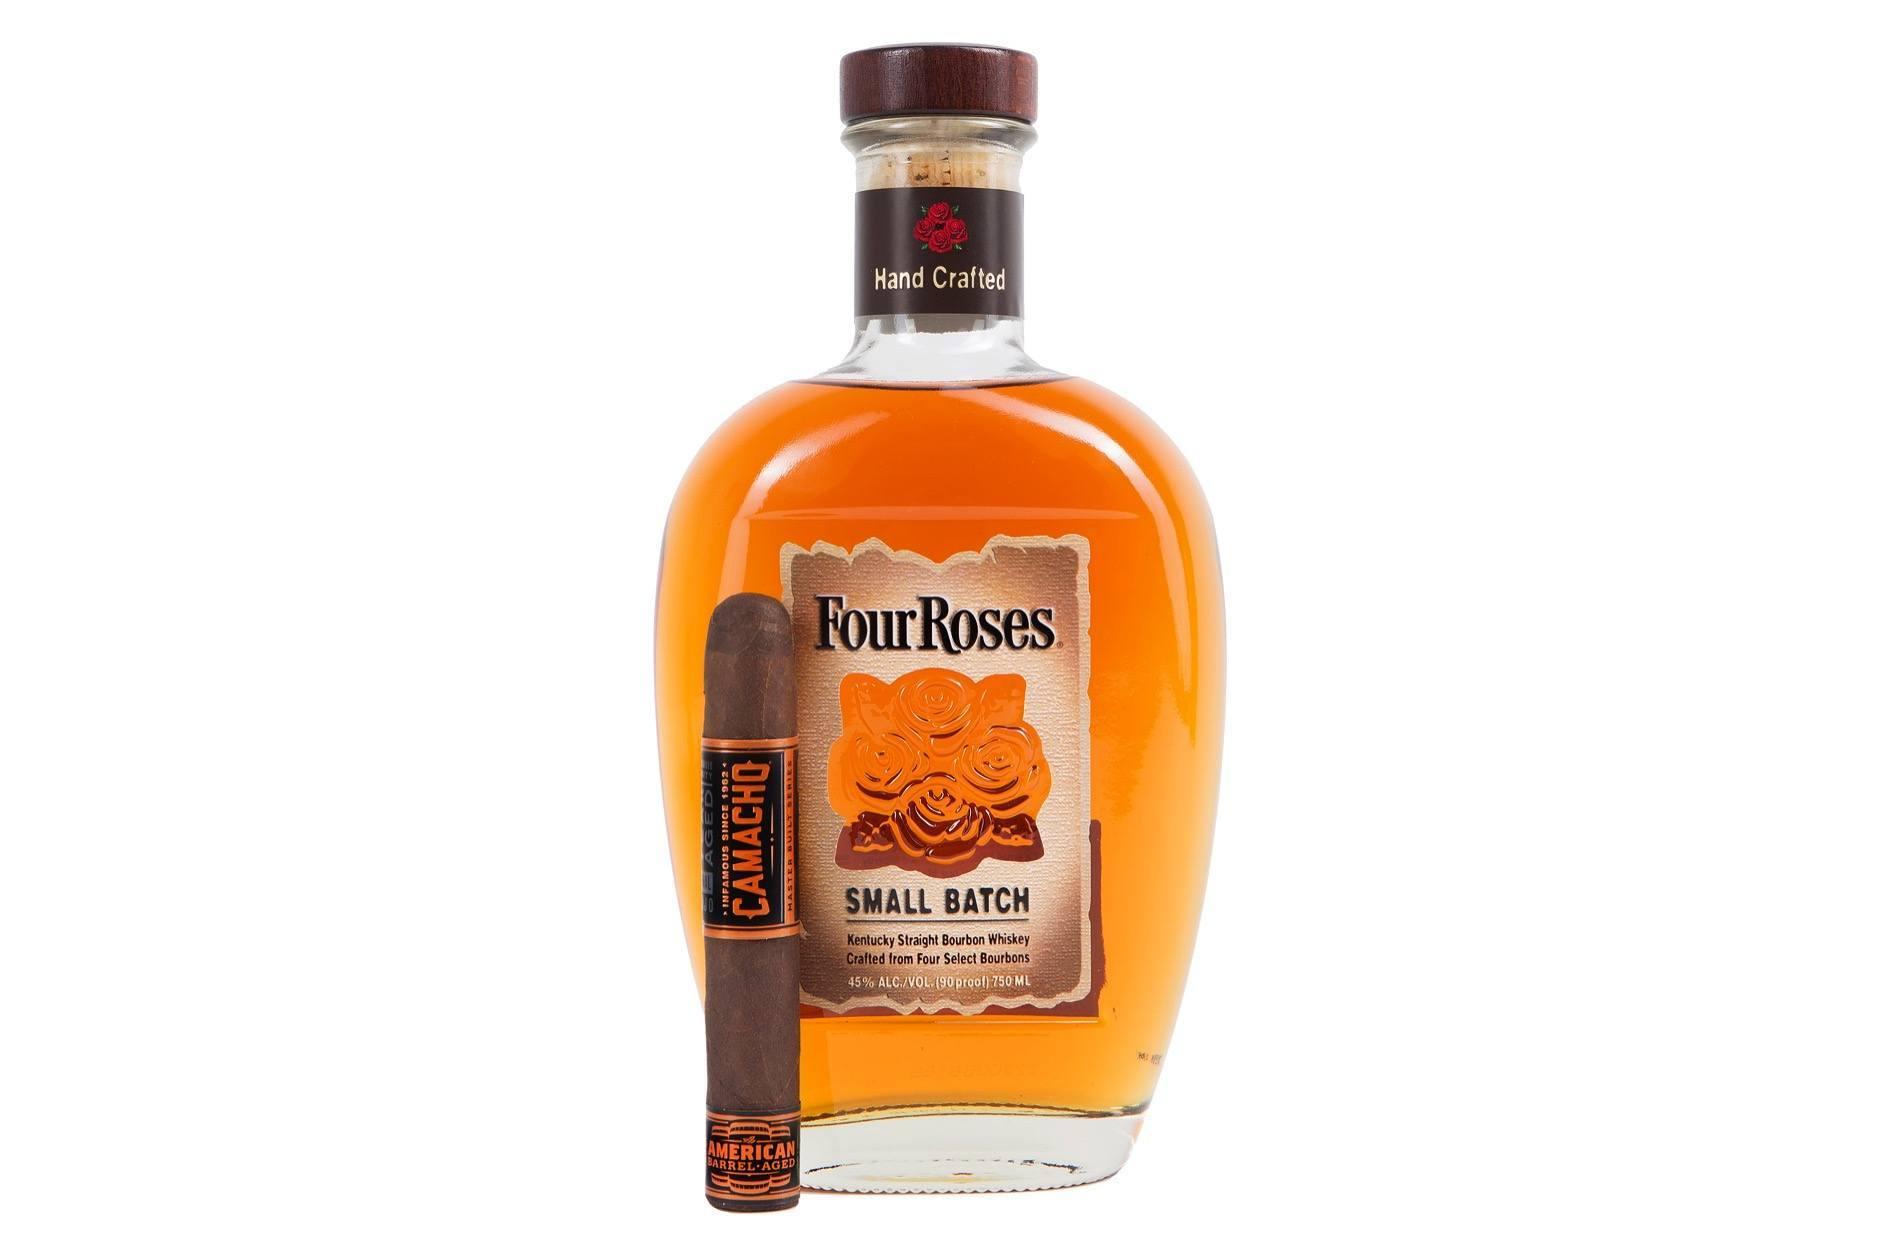 Camacho American Barrel Aged Bourbon Four Roses